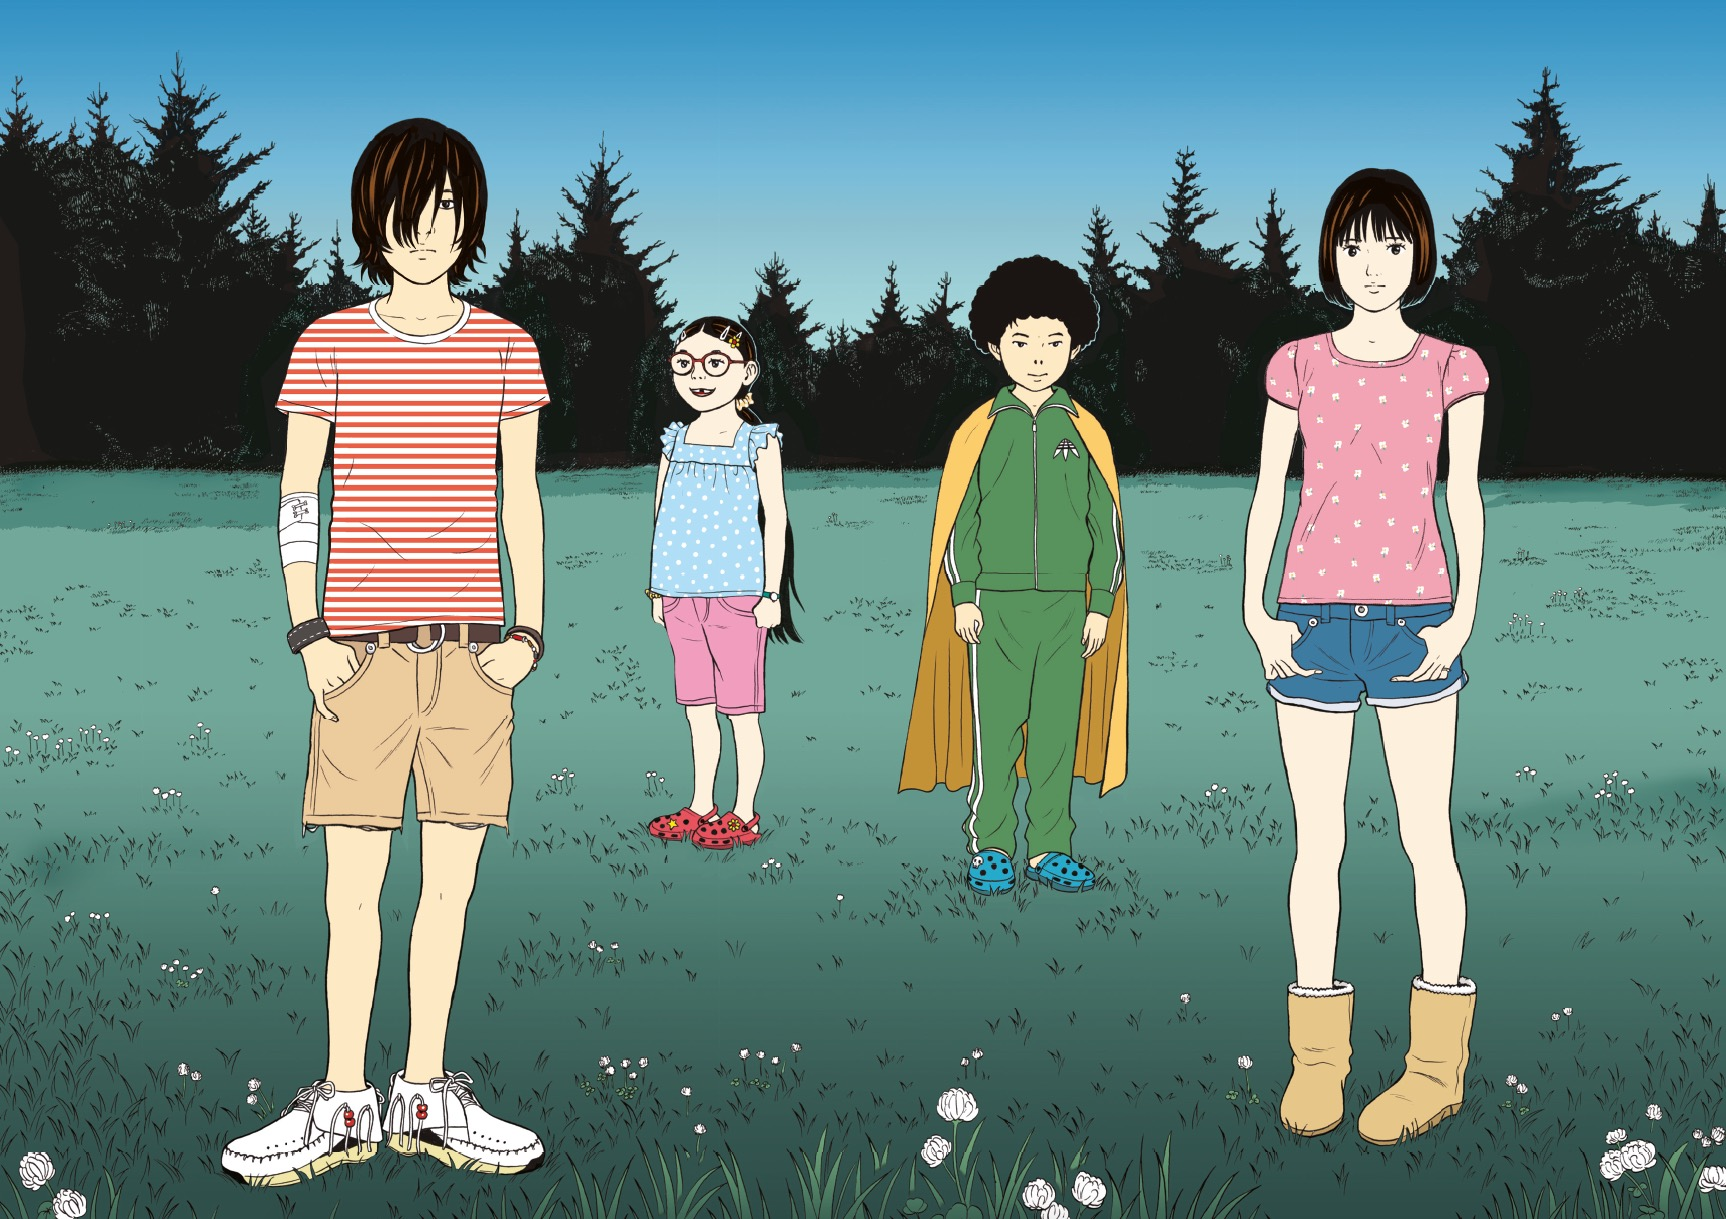 Hashi, Mari, Hideo et Hana (de gauche à droite) © 2017 by Minetarô Mochizuki / KODANSHA / Le Lézard Noir